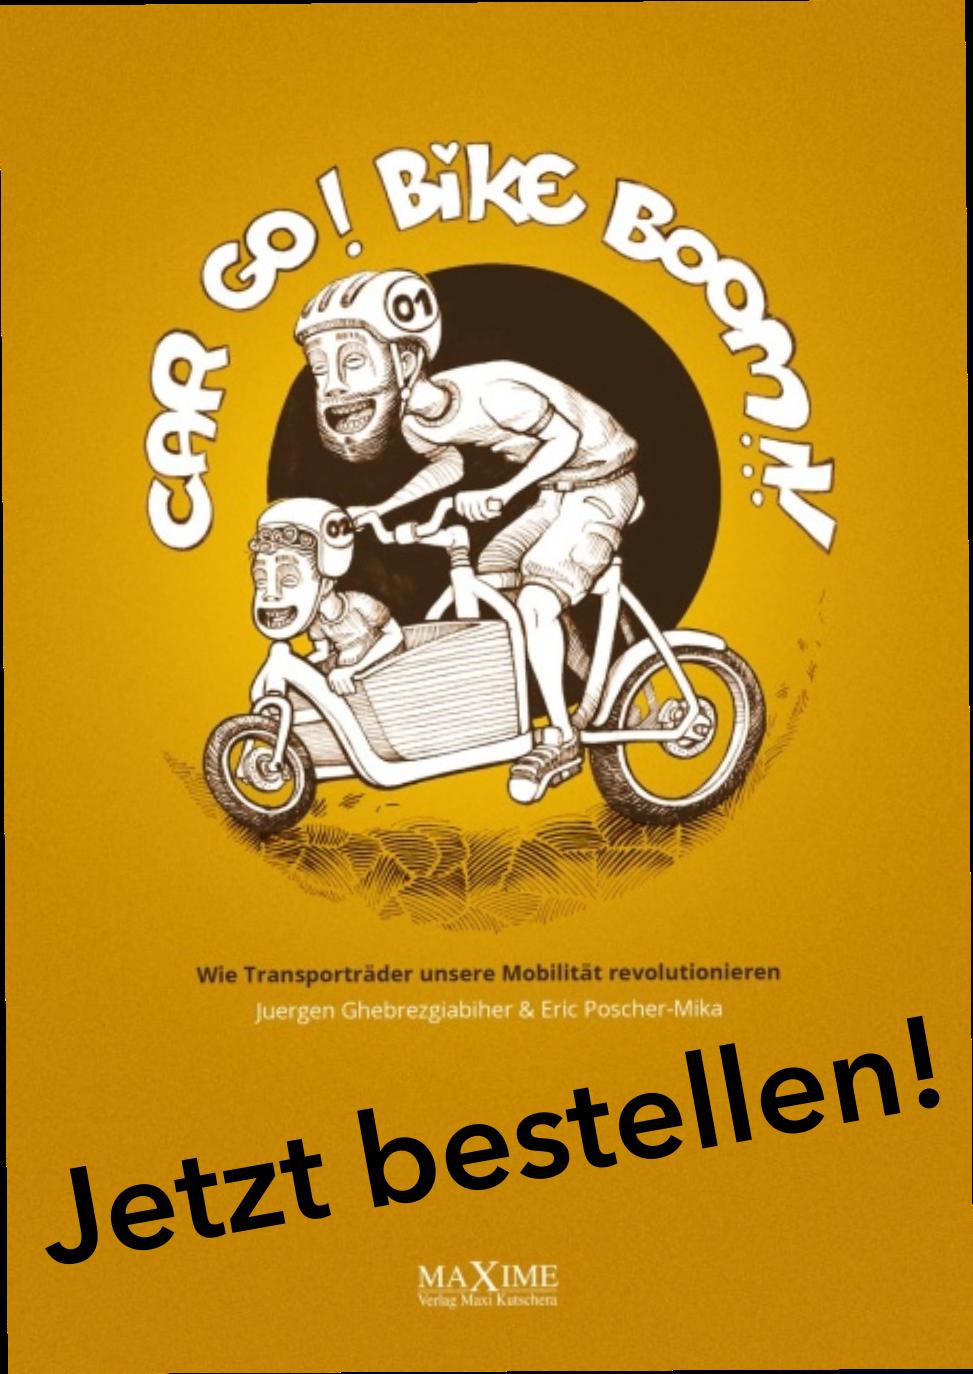 Car Go Bike Boom jetzt bestellen